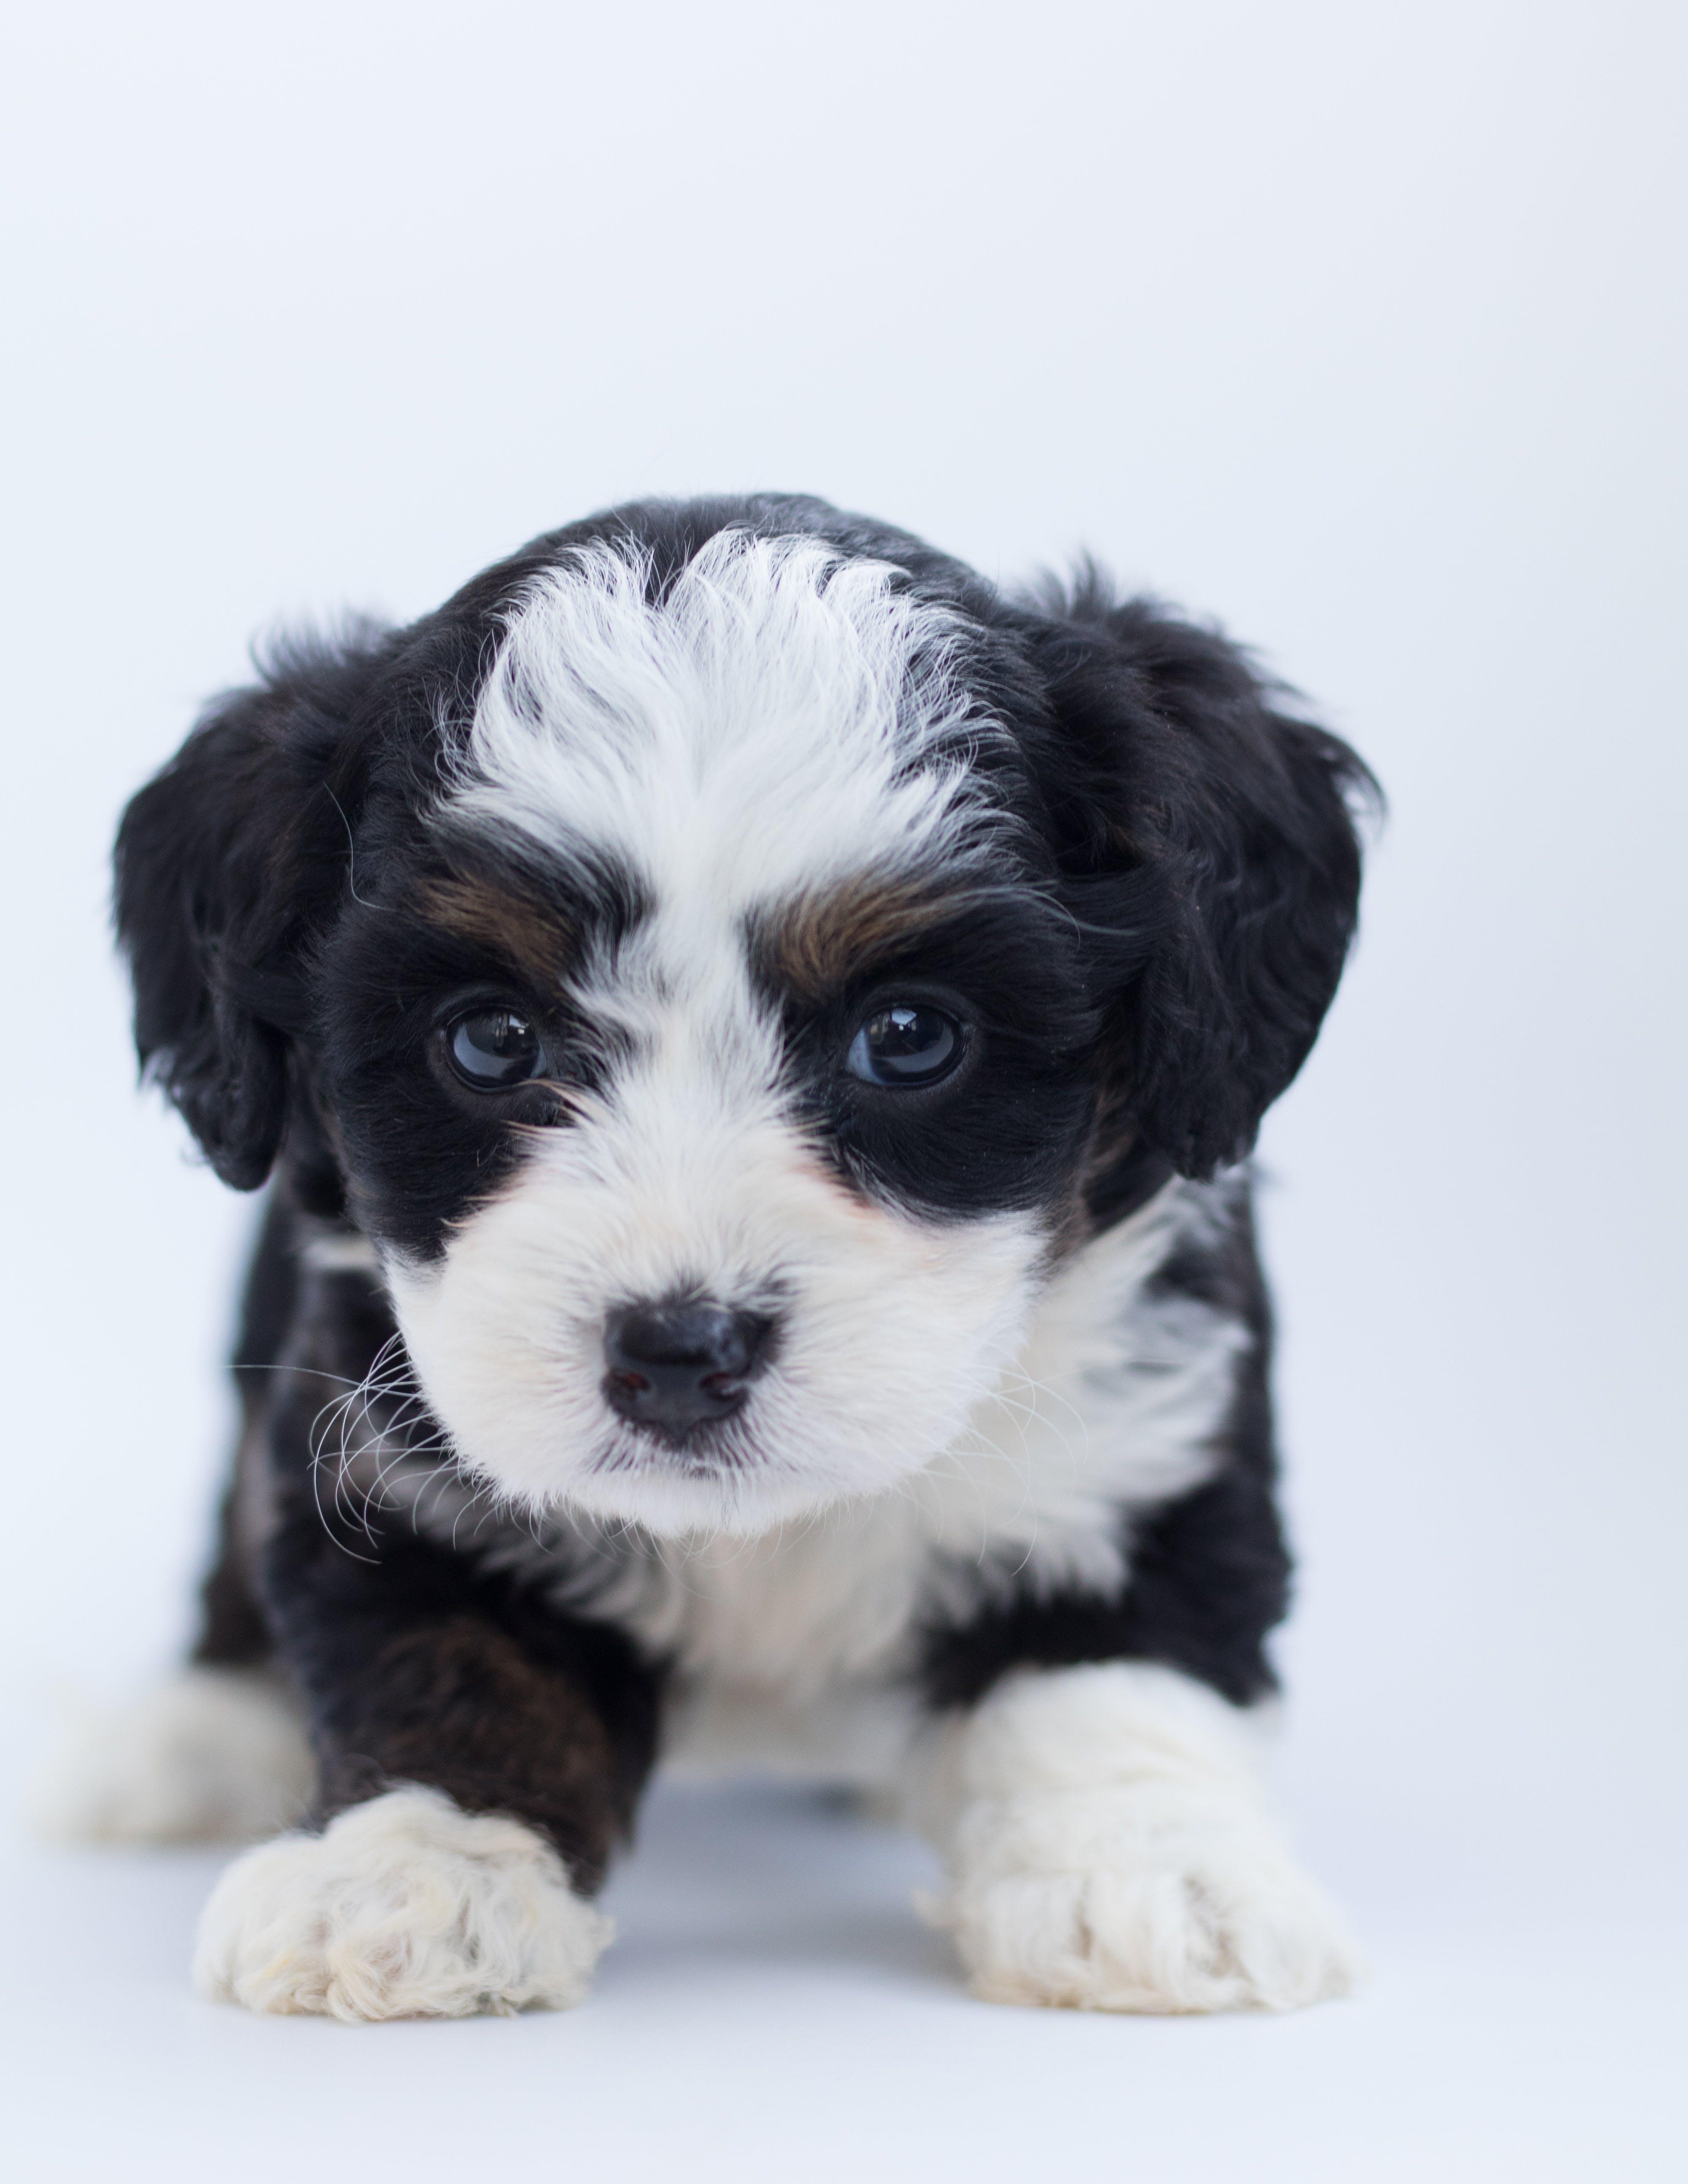 Black and White Maltese Puppy